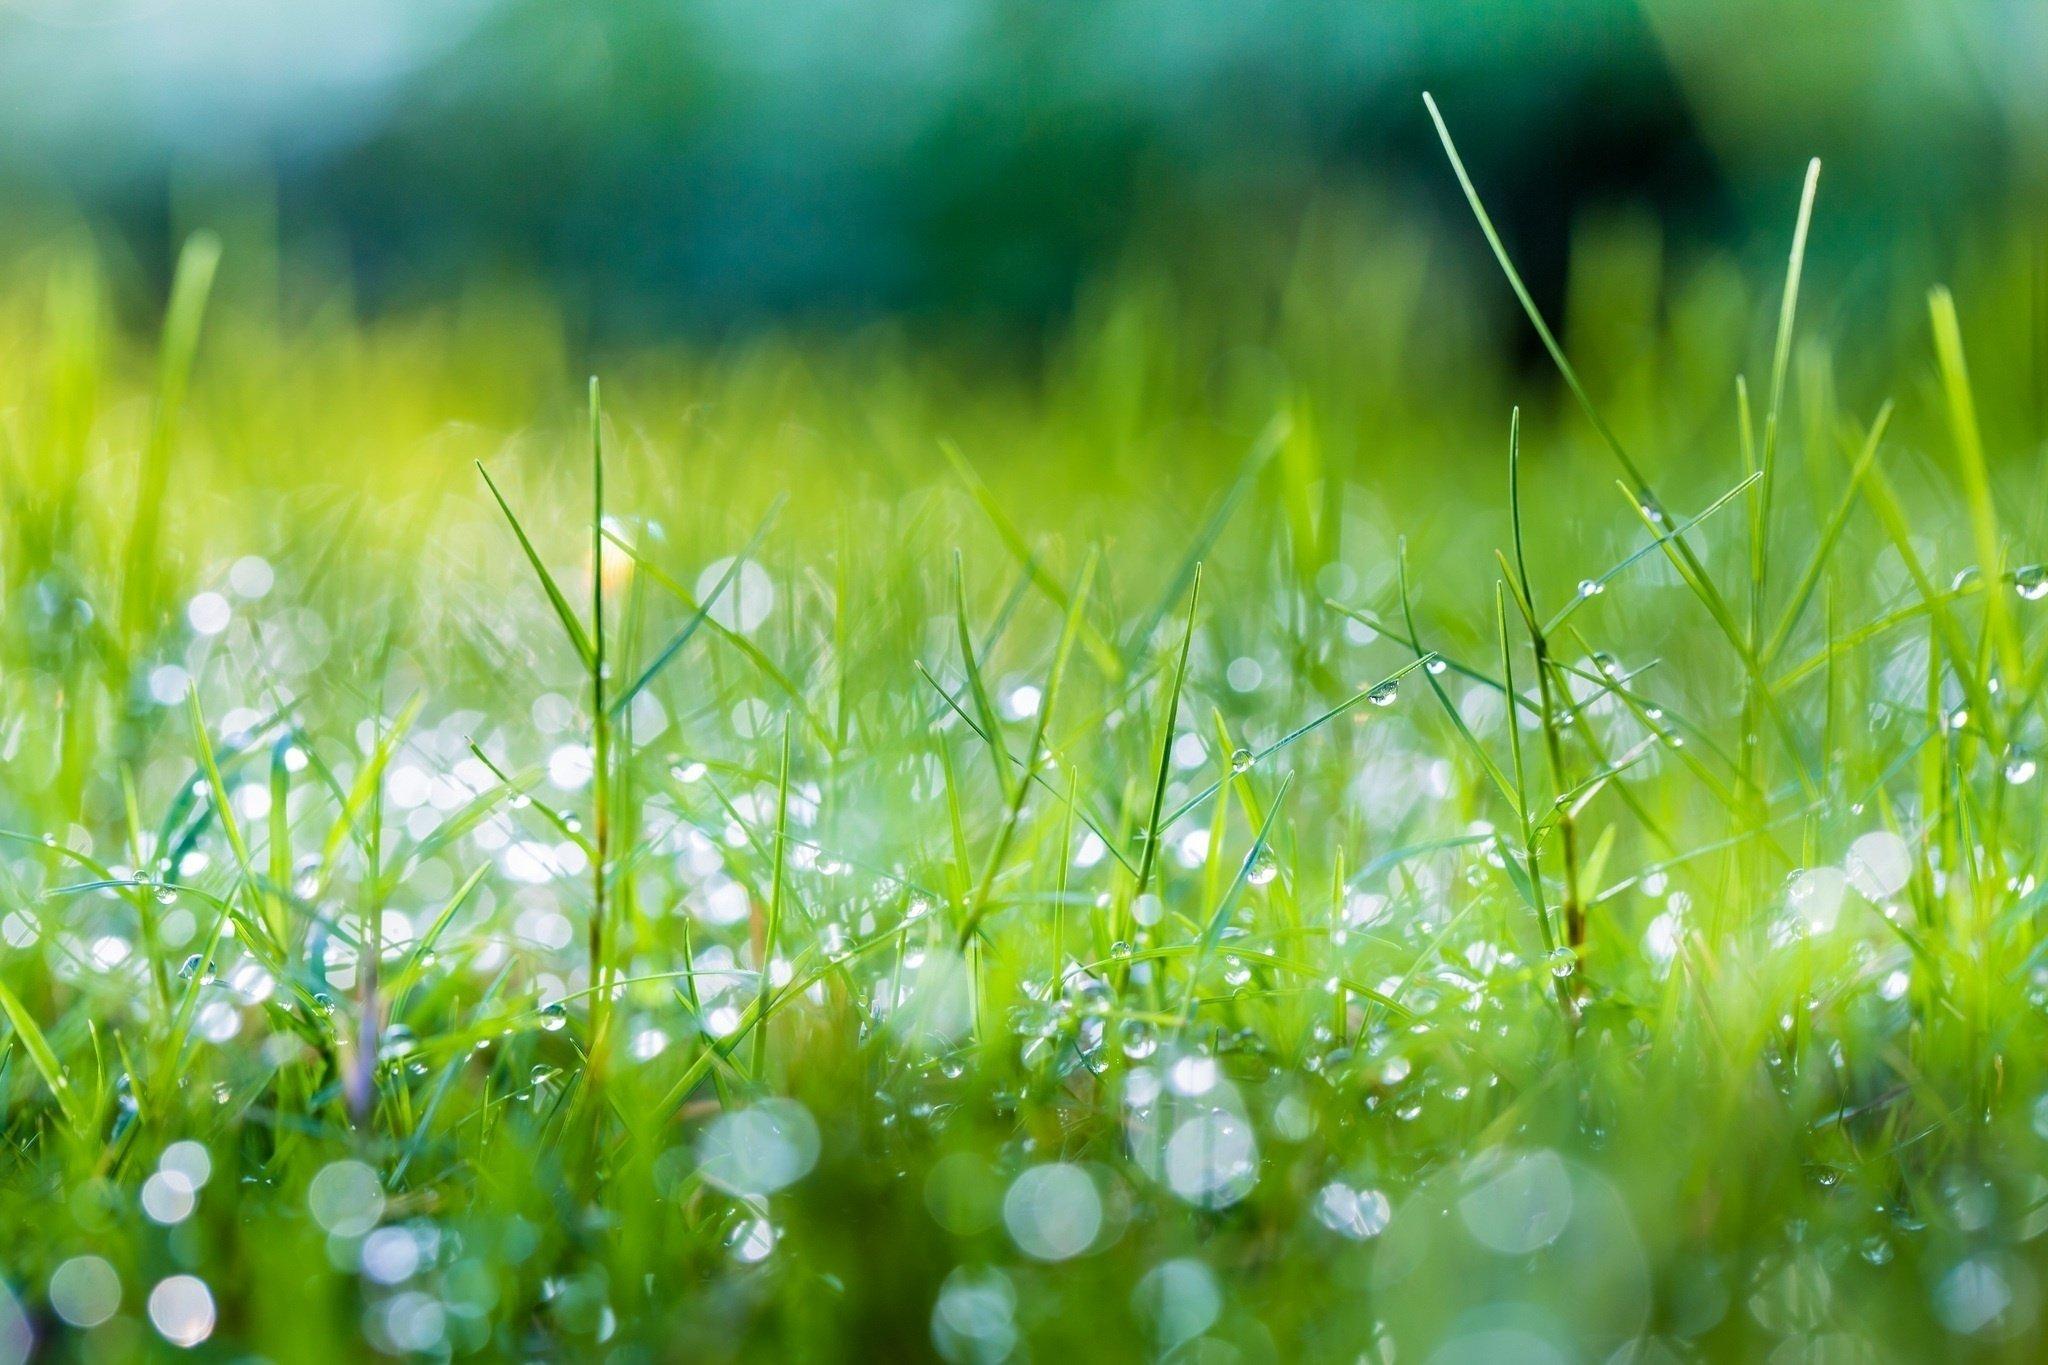 Spring Start Grass Dew Drops Shine Summer Macro Green Wallpaper